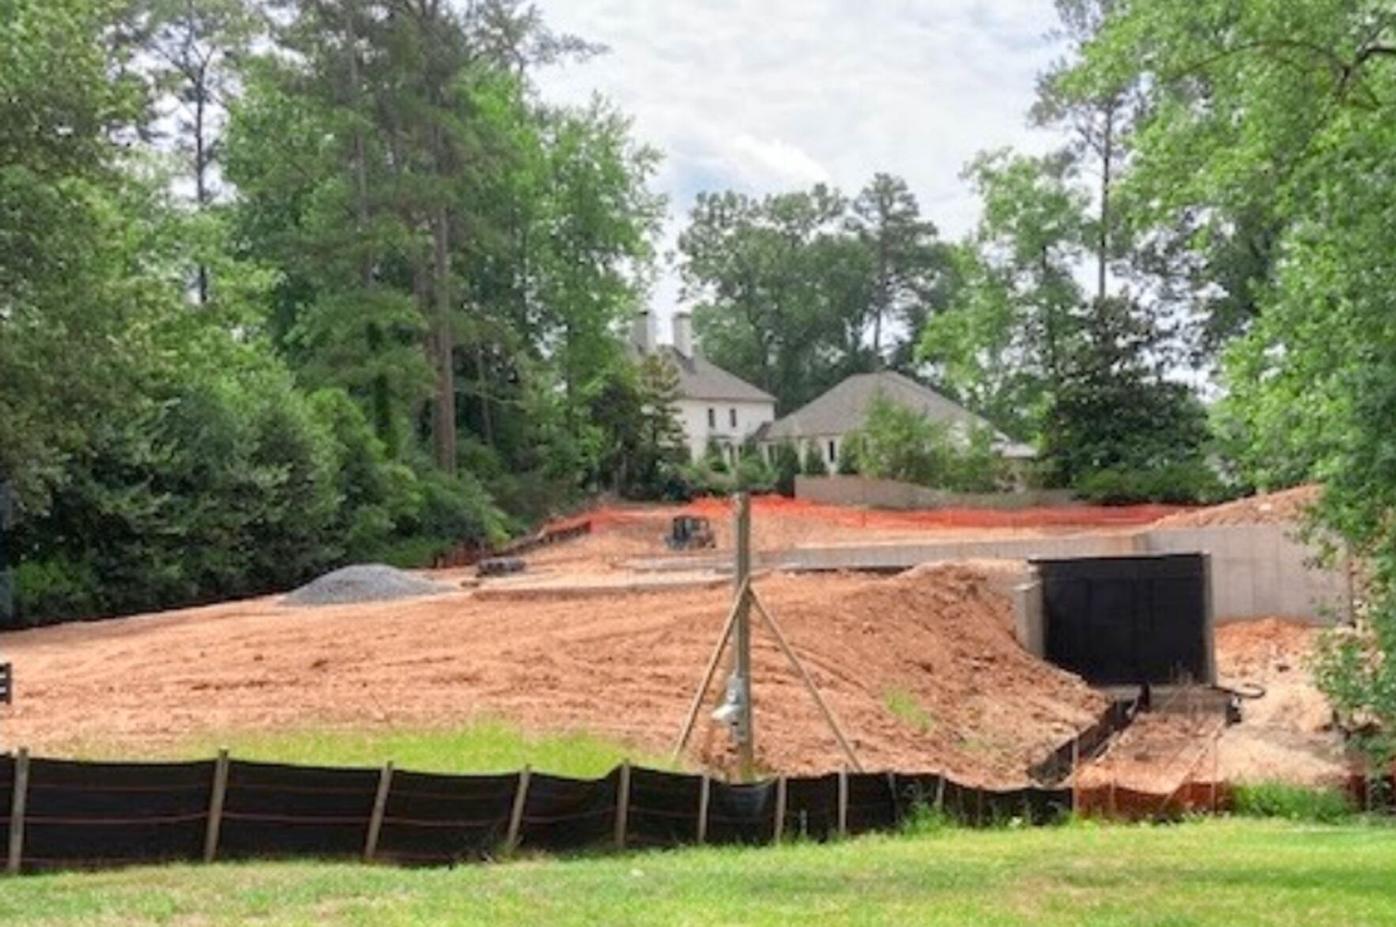 071421_MNS_ATL_zoning_002 new Atlanta home construction